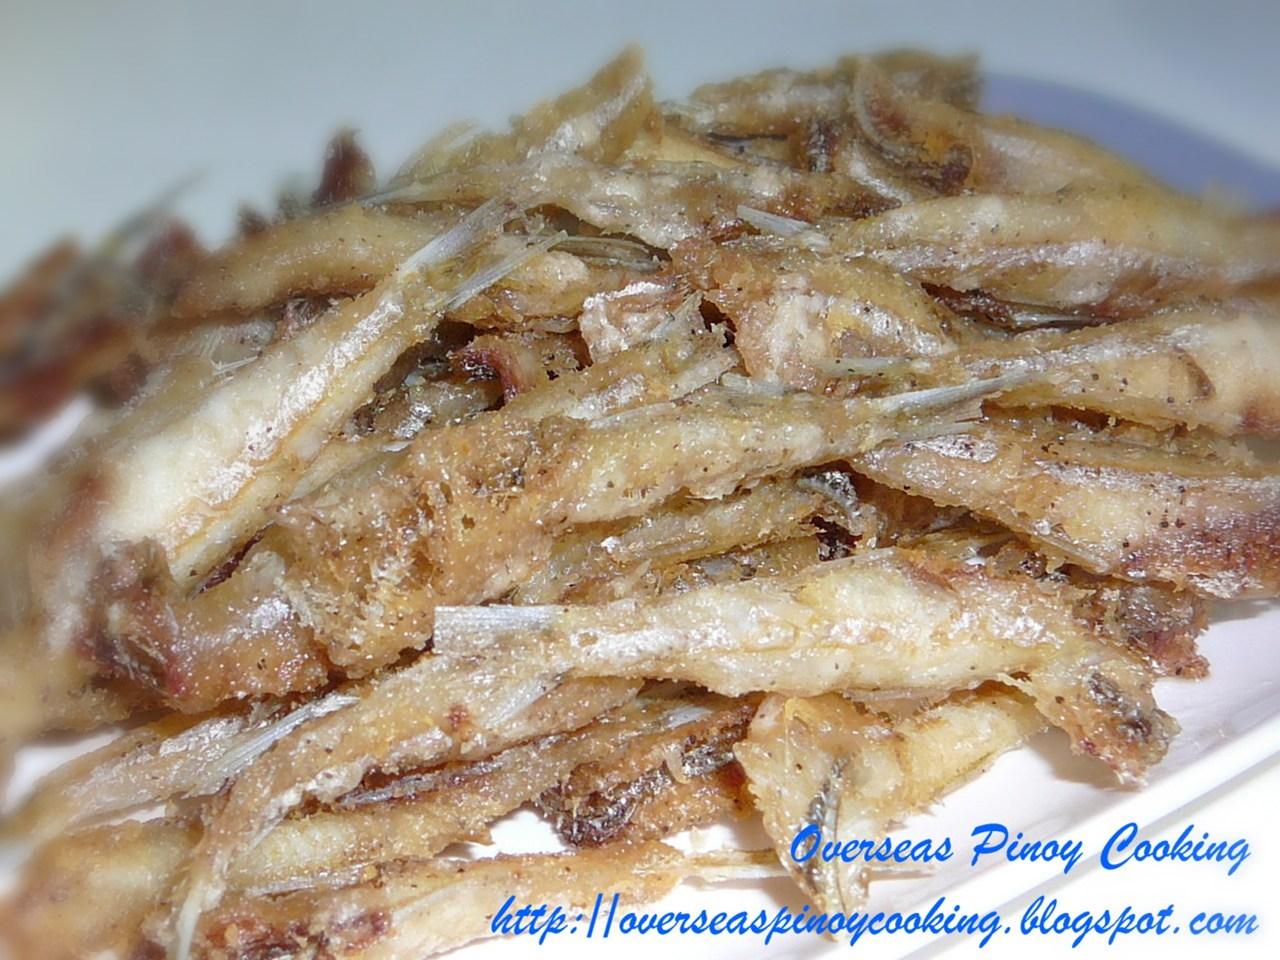 Thai crispy fried fish recipe for Fried fish recipe